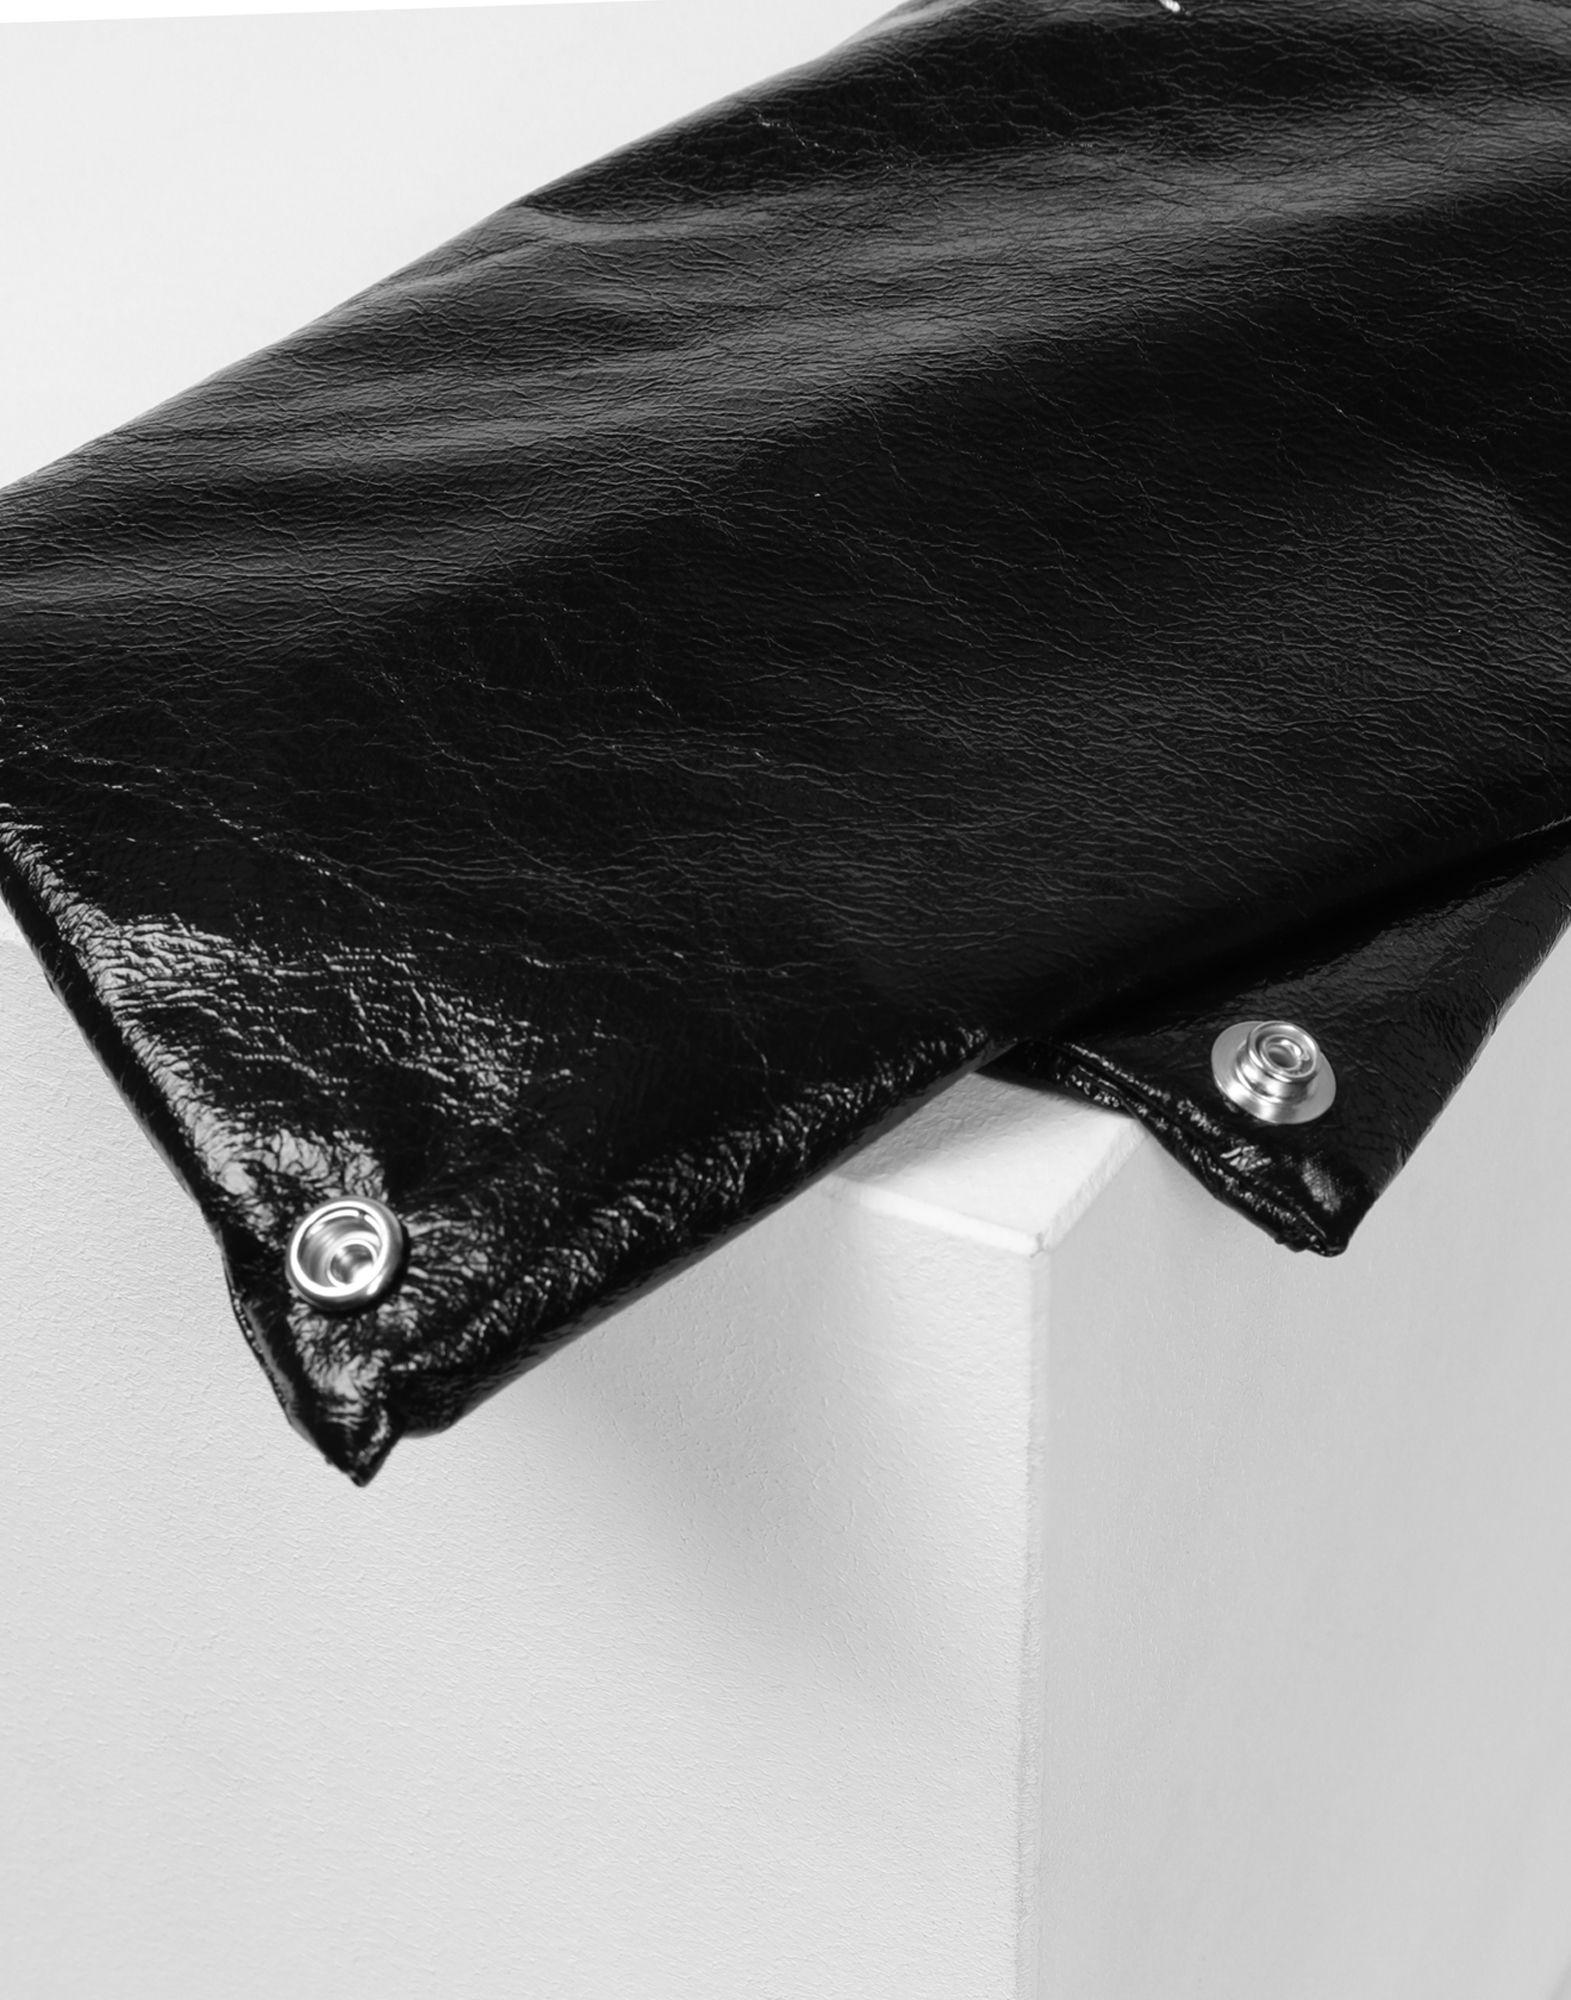 MM6 MAISON MARGIELA Japanese crinkled leather small bag Tote Woman e